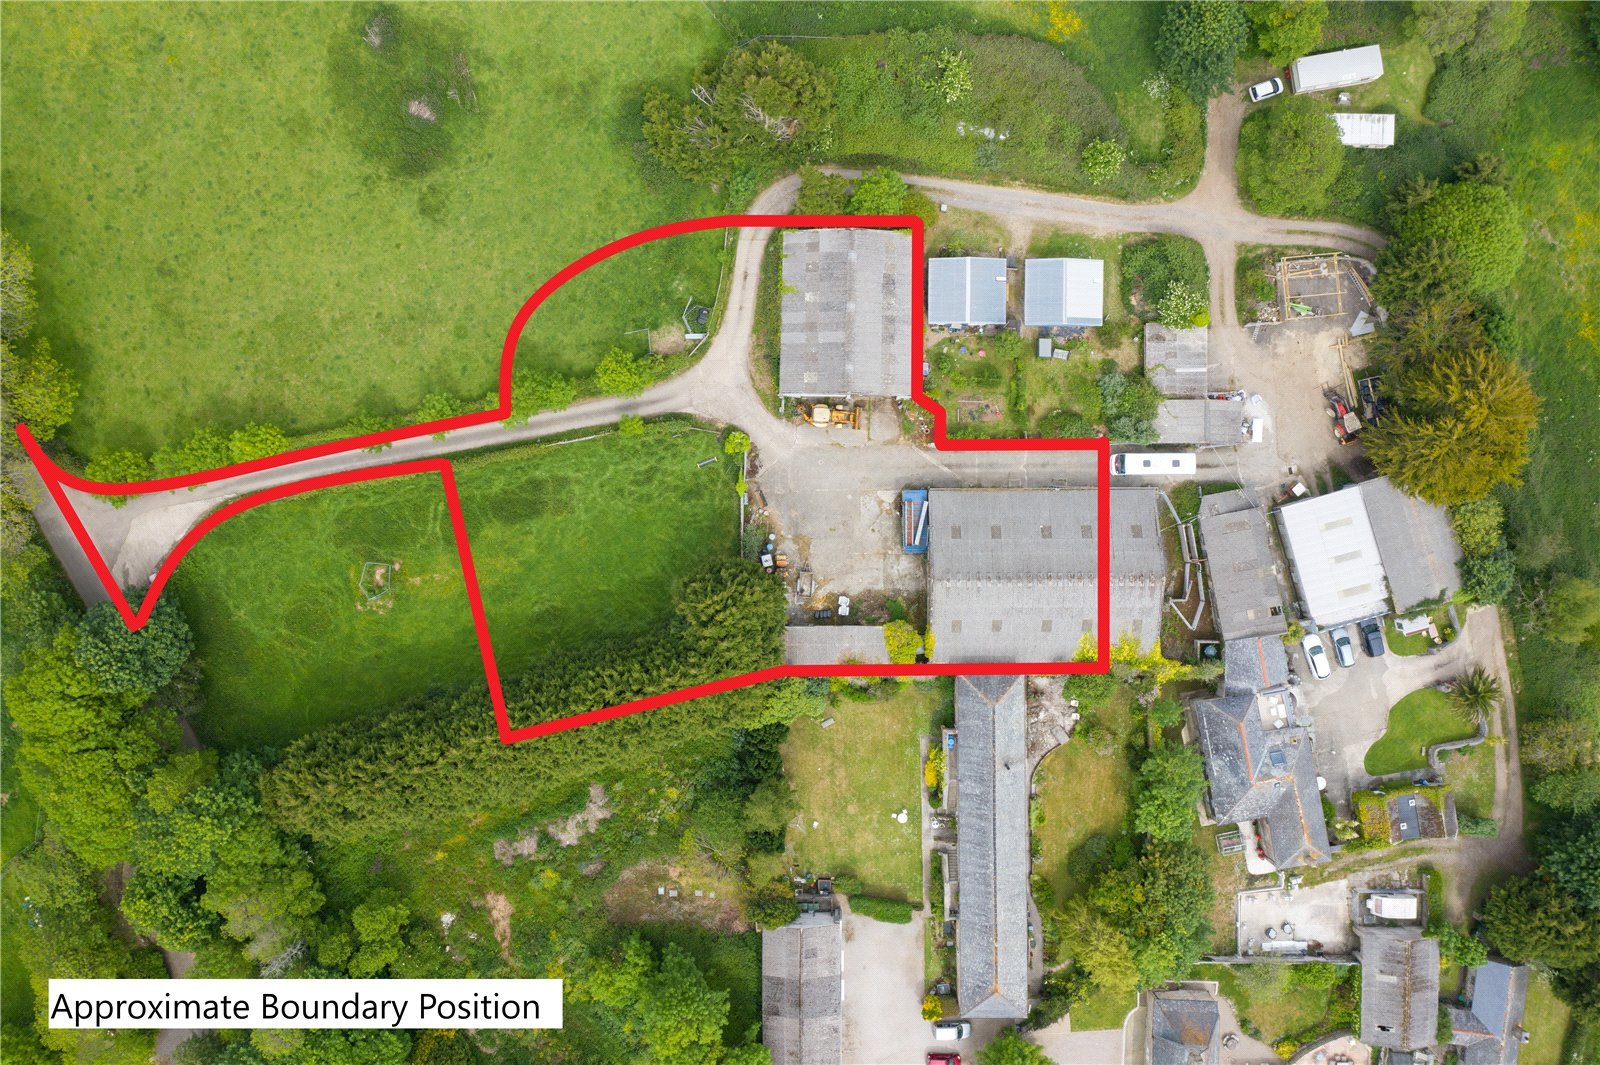 Rosevidney Barton Plot, Crowlas, Penzance, Cornwall